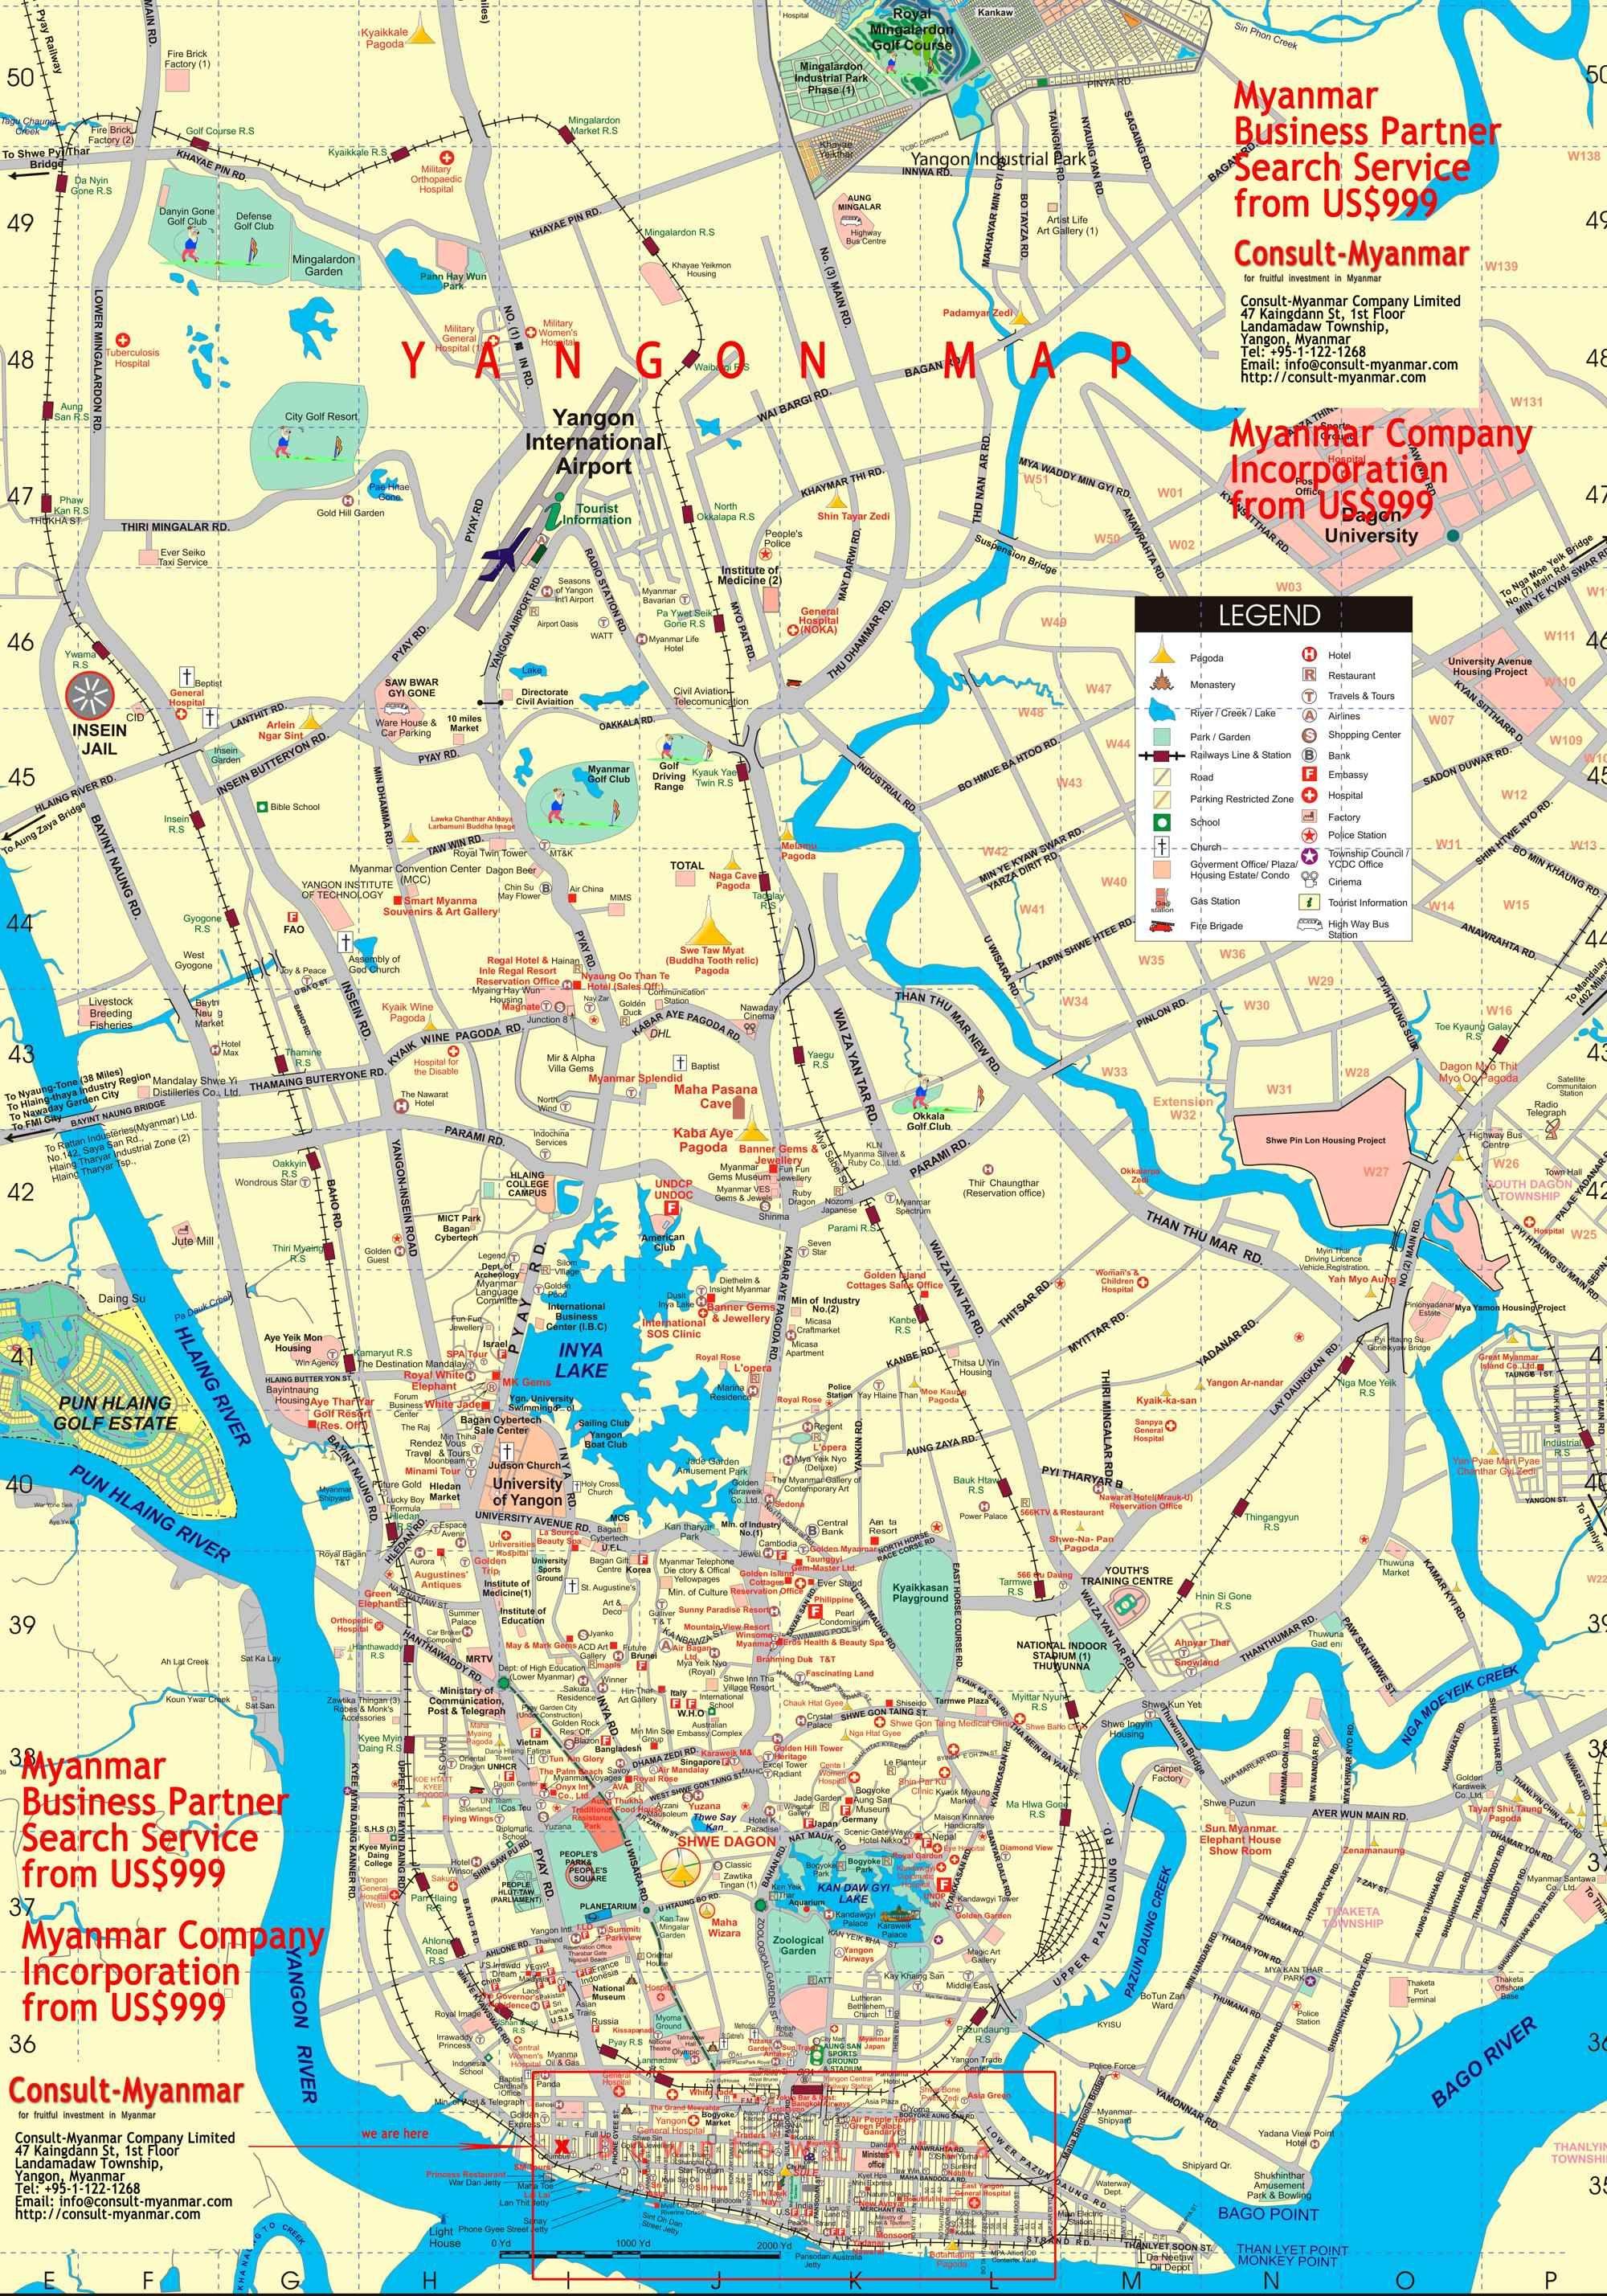 Pin by Cathy Nepomuceno on Yangon Myanmar in 2019 | Yangon ... Imperialism Map Of Burma on burma economy, burma india, burma terrorism, burma buddhism, burma capital, burma military, burma africa, burma religion, burma britain, burma art, burma geography, burma iran, burma government, burma war, burma 1920s, burma genocide, burma china, burma 19th century, burma muslim,